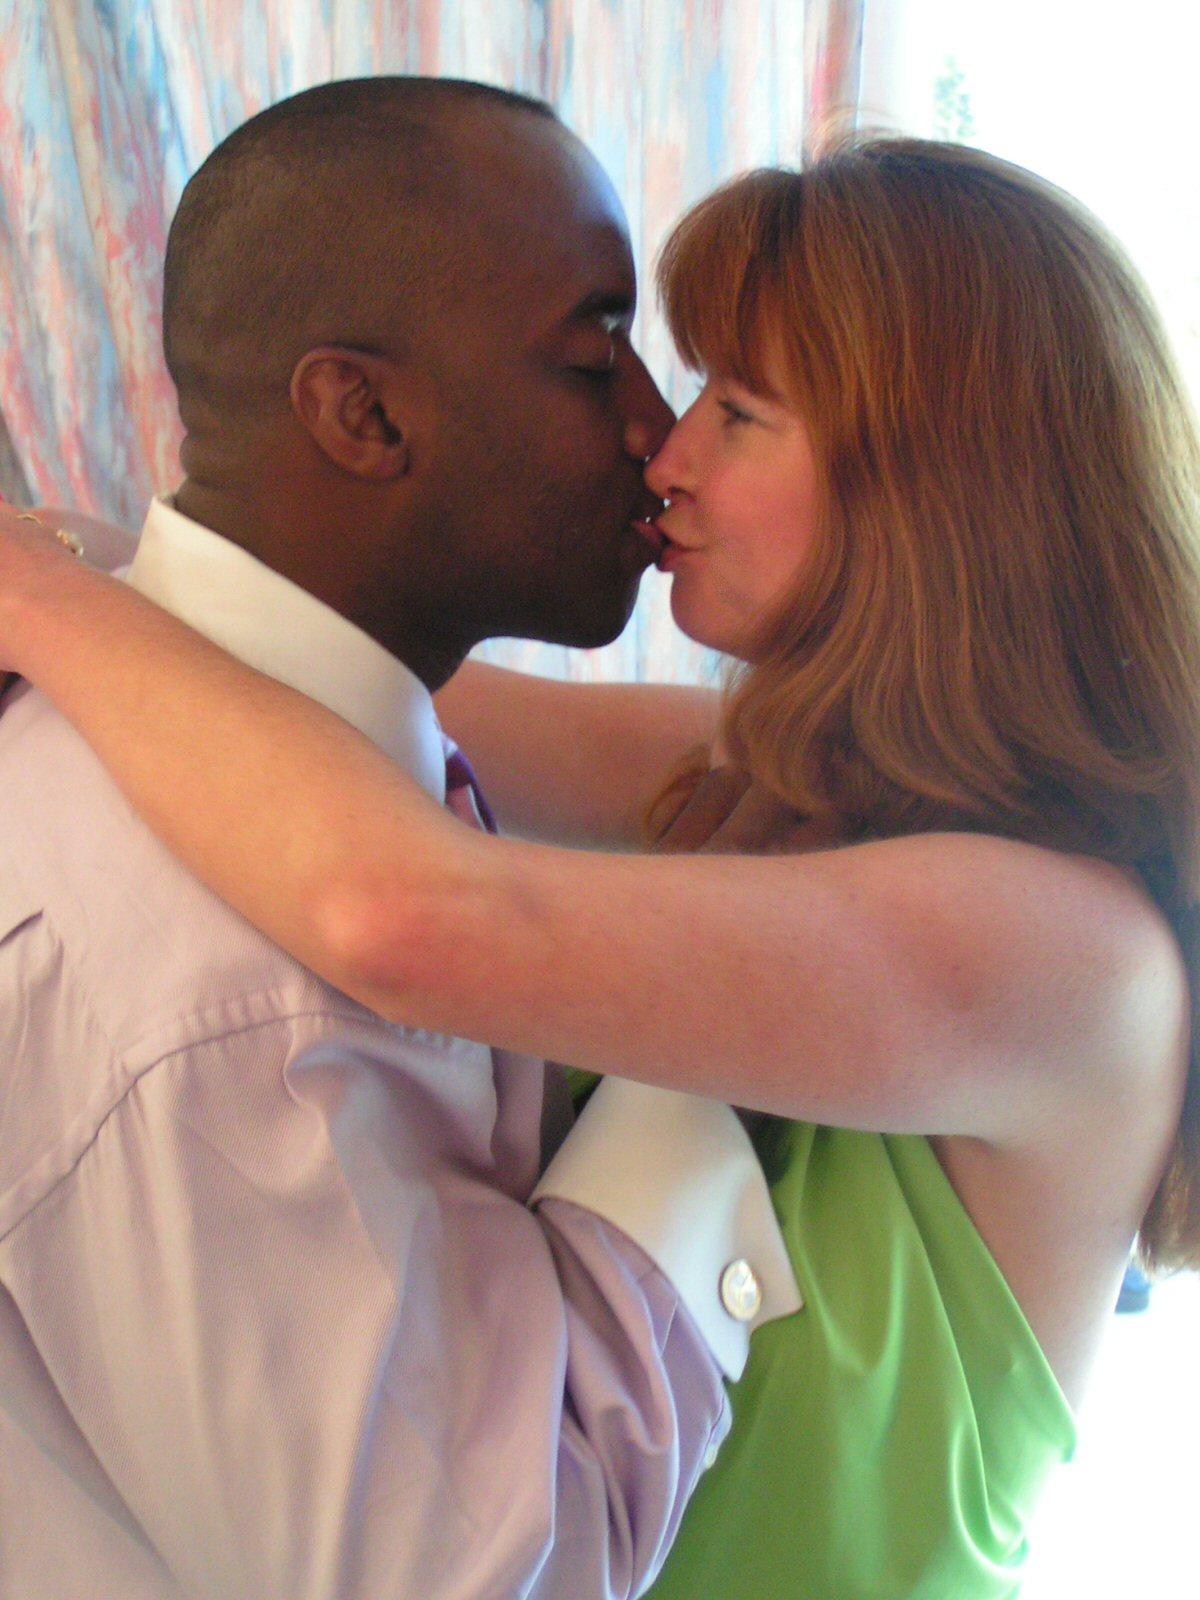 Dfwknight Interracial - Sex Porn Images